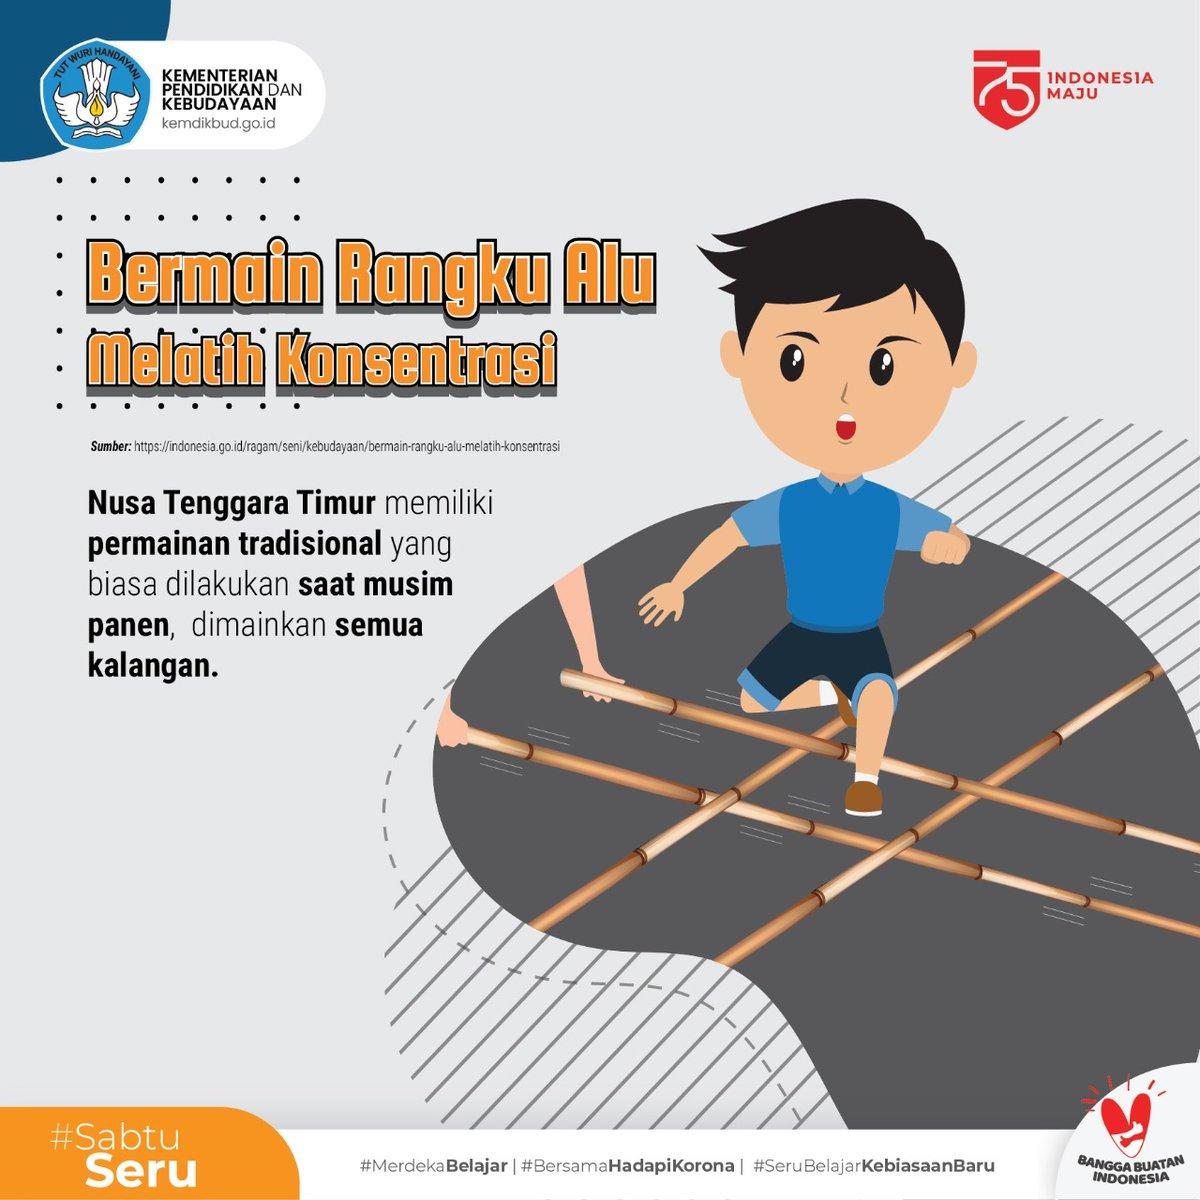 Merdekabelajar V Twitter Tahukah Sahabatdikbud Selain Menghibur Permainan Rangku Alu Juga Membentuk Karakter Dengan Melatih Konsentrasi Dan Ketepatan Dalam Bertindak Sahabatdikbud Pernah Mencoba Permainan Asal Nusa Tenggara Timur Ini Sabtuseru